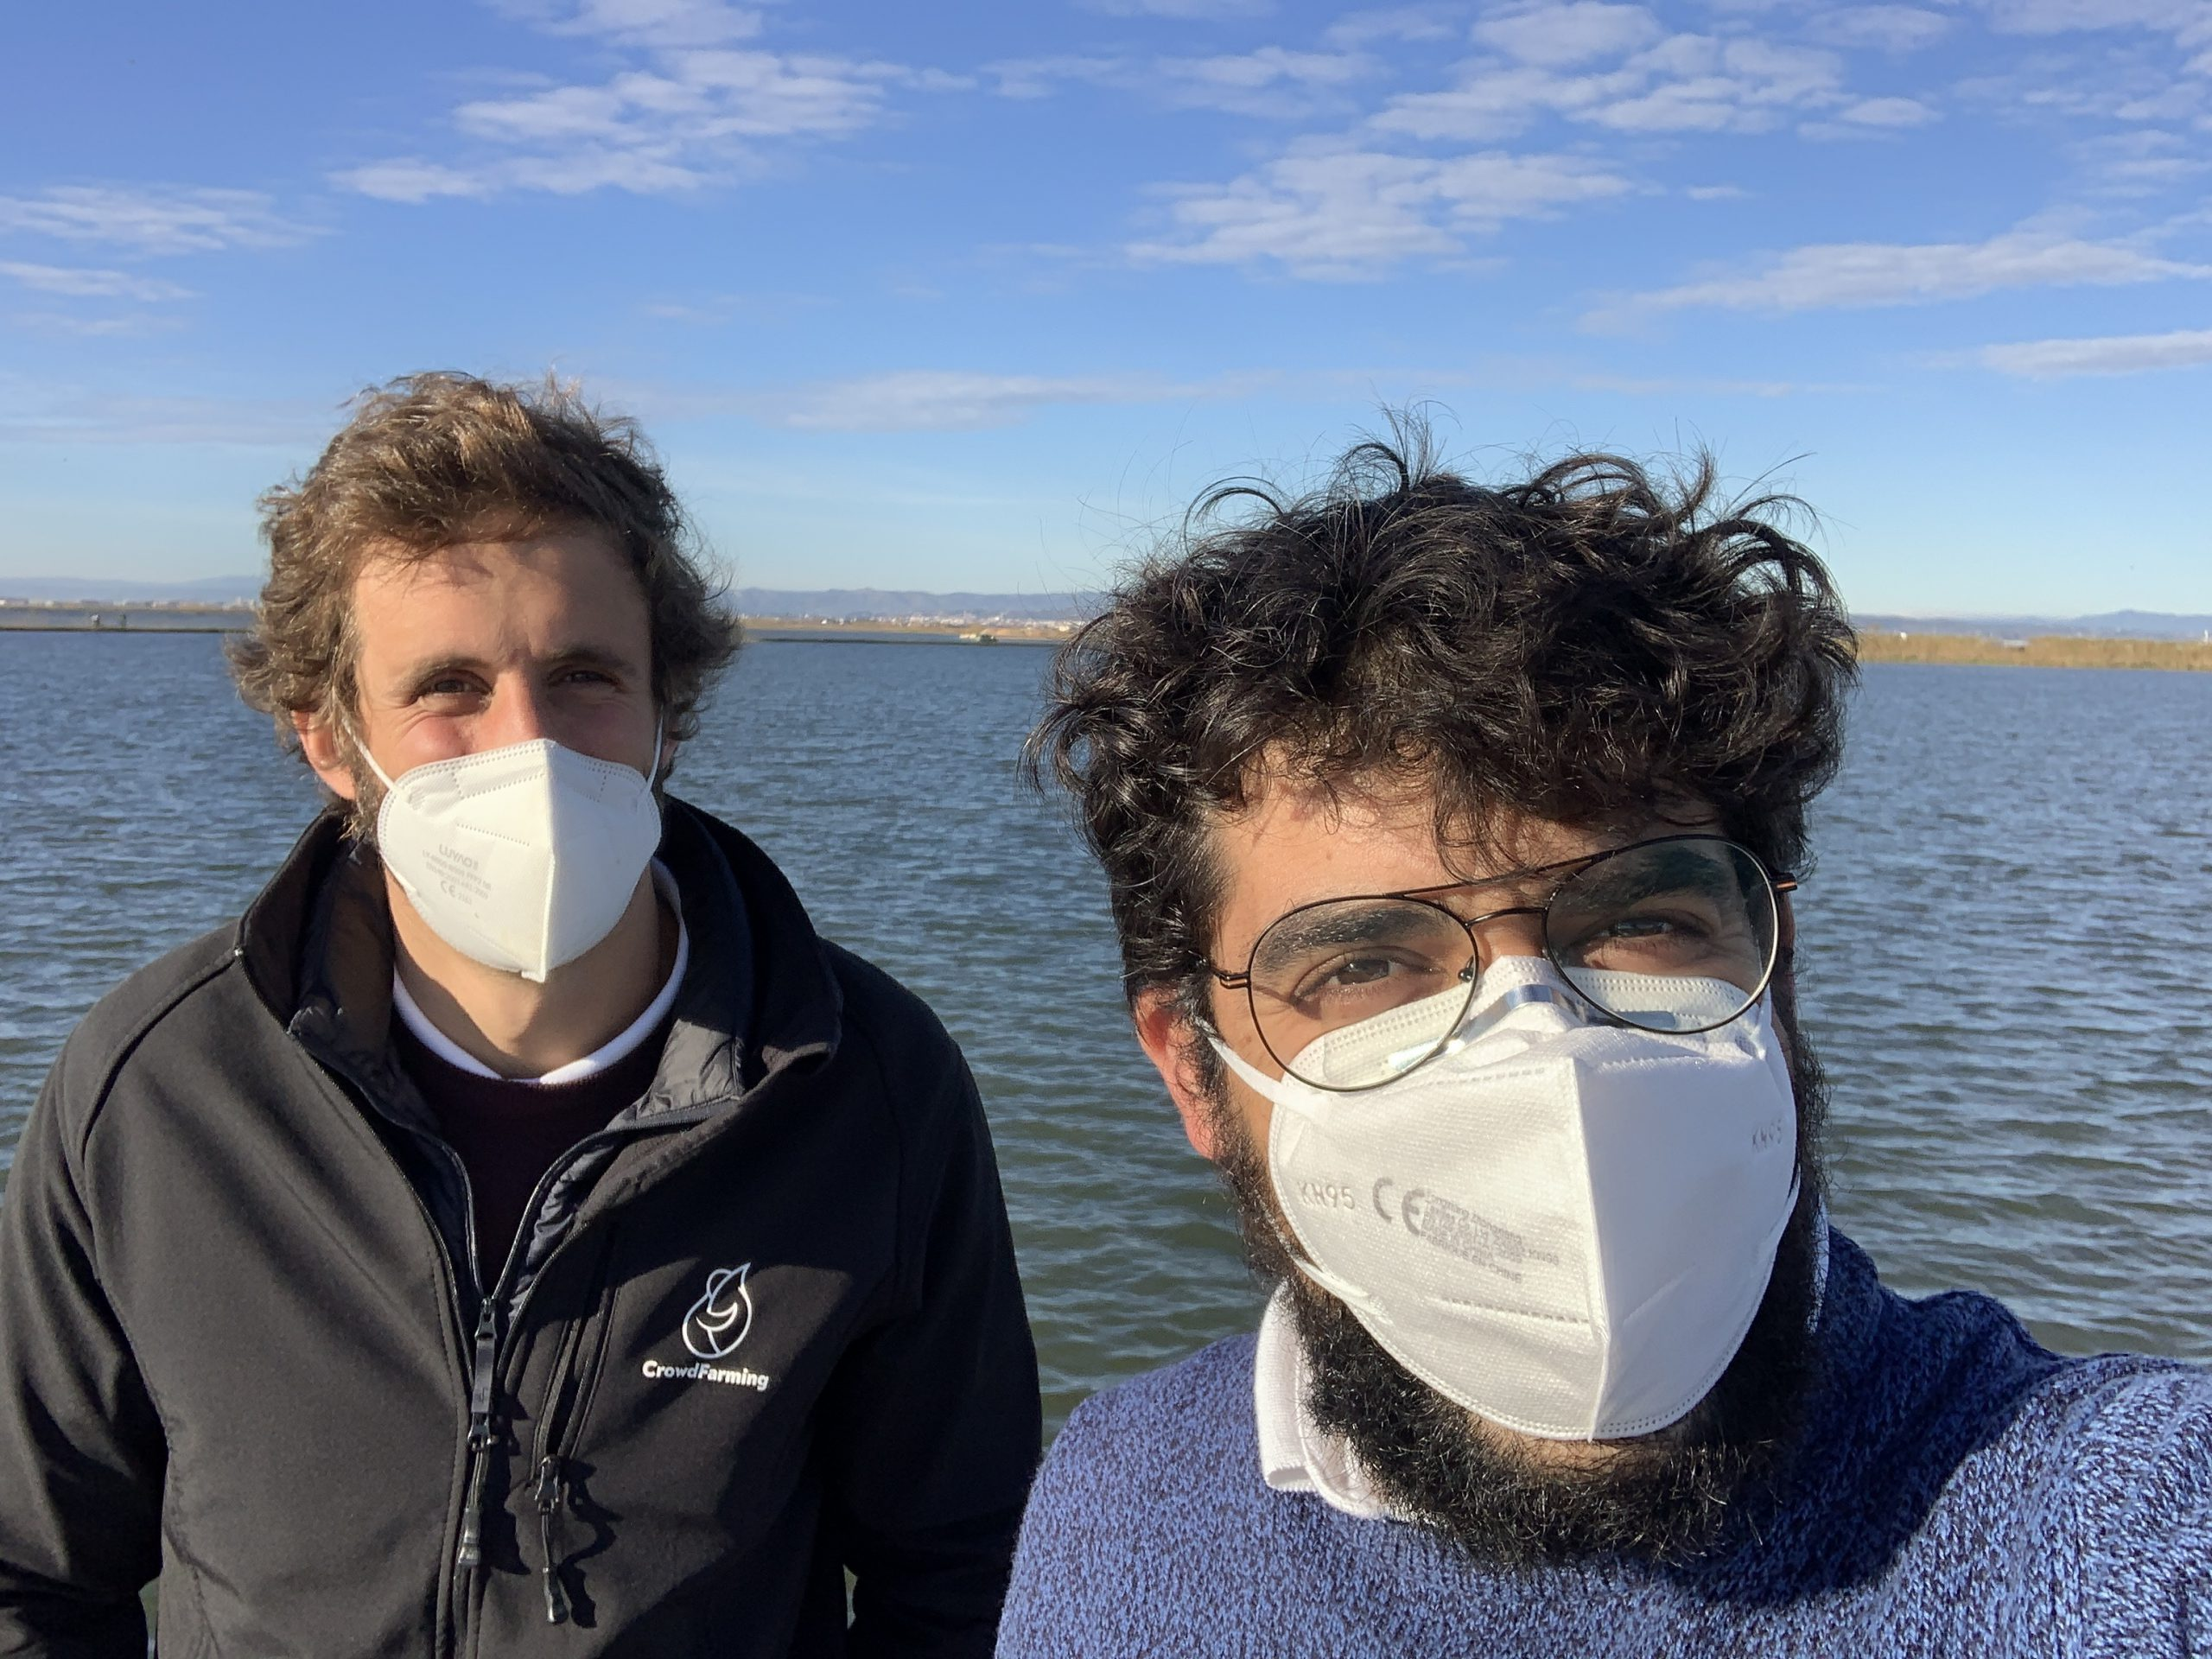 Juan Plasencia and Javi Tornos at the Valencia seaside